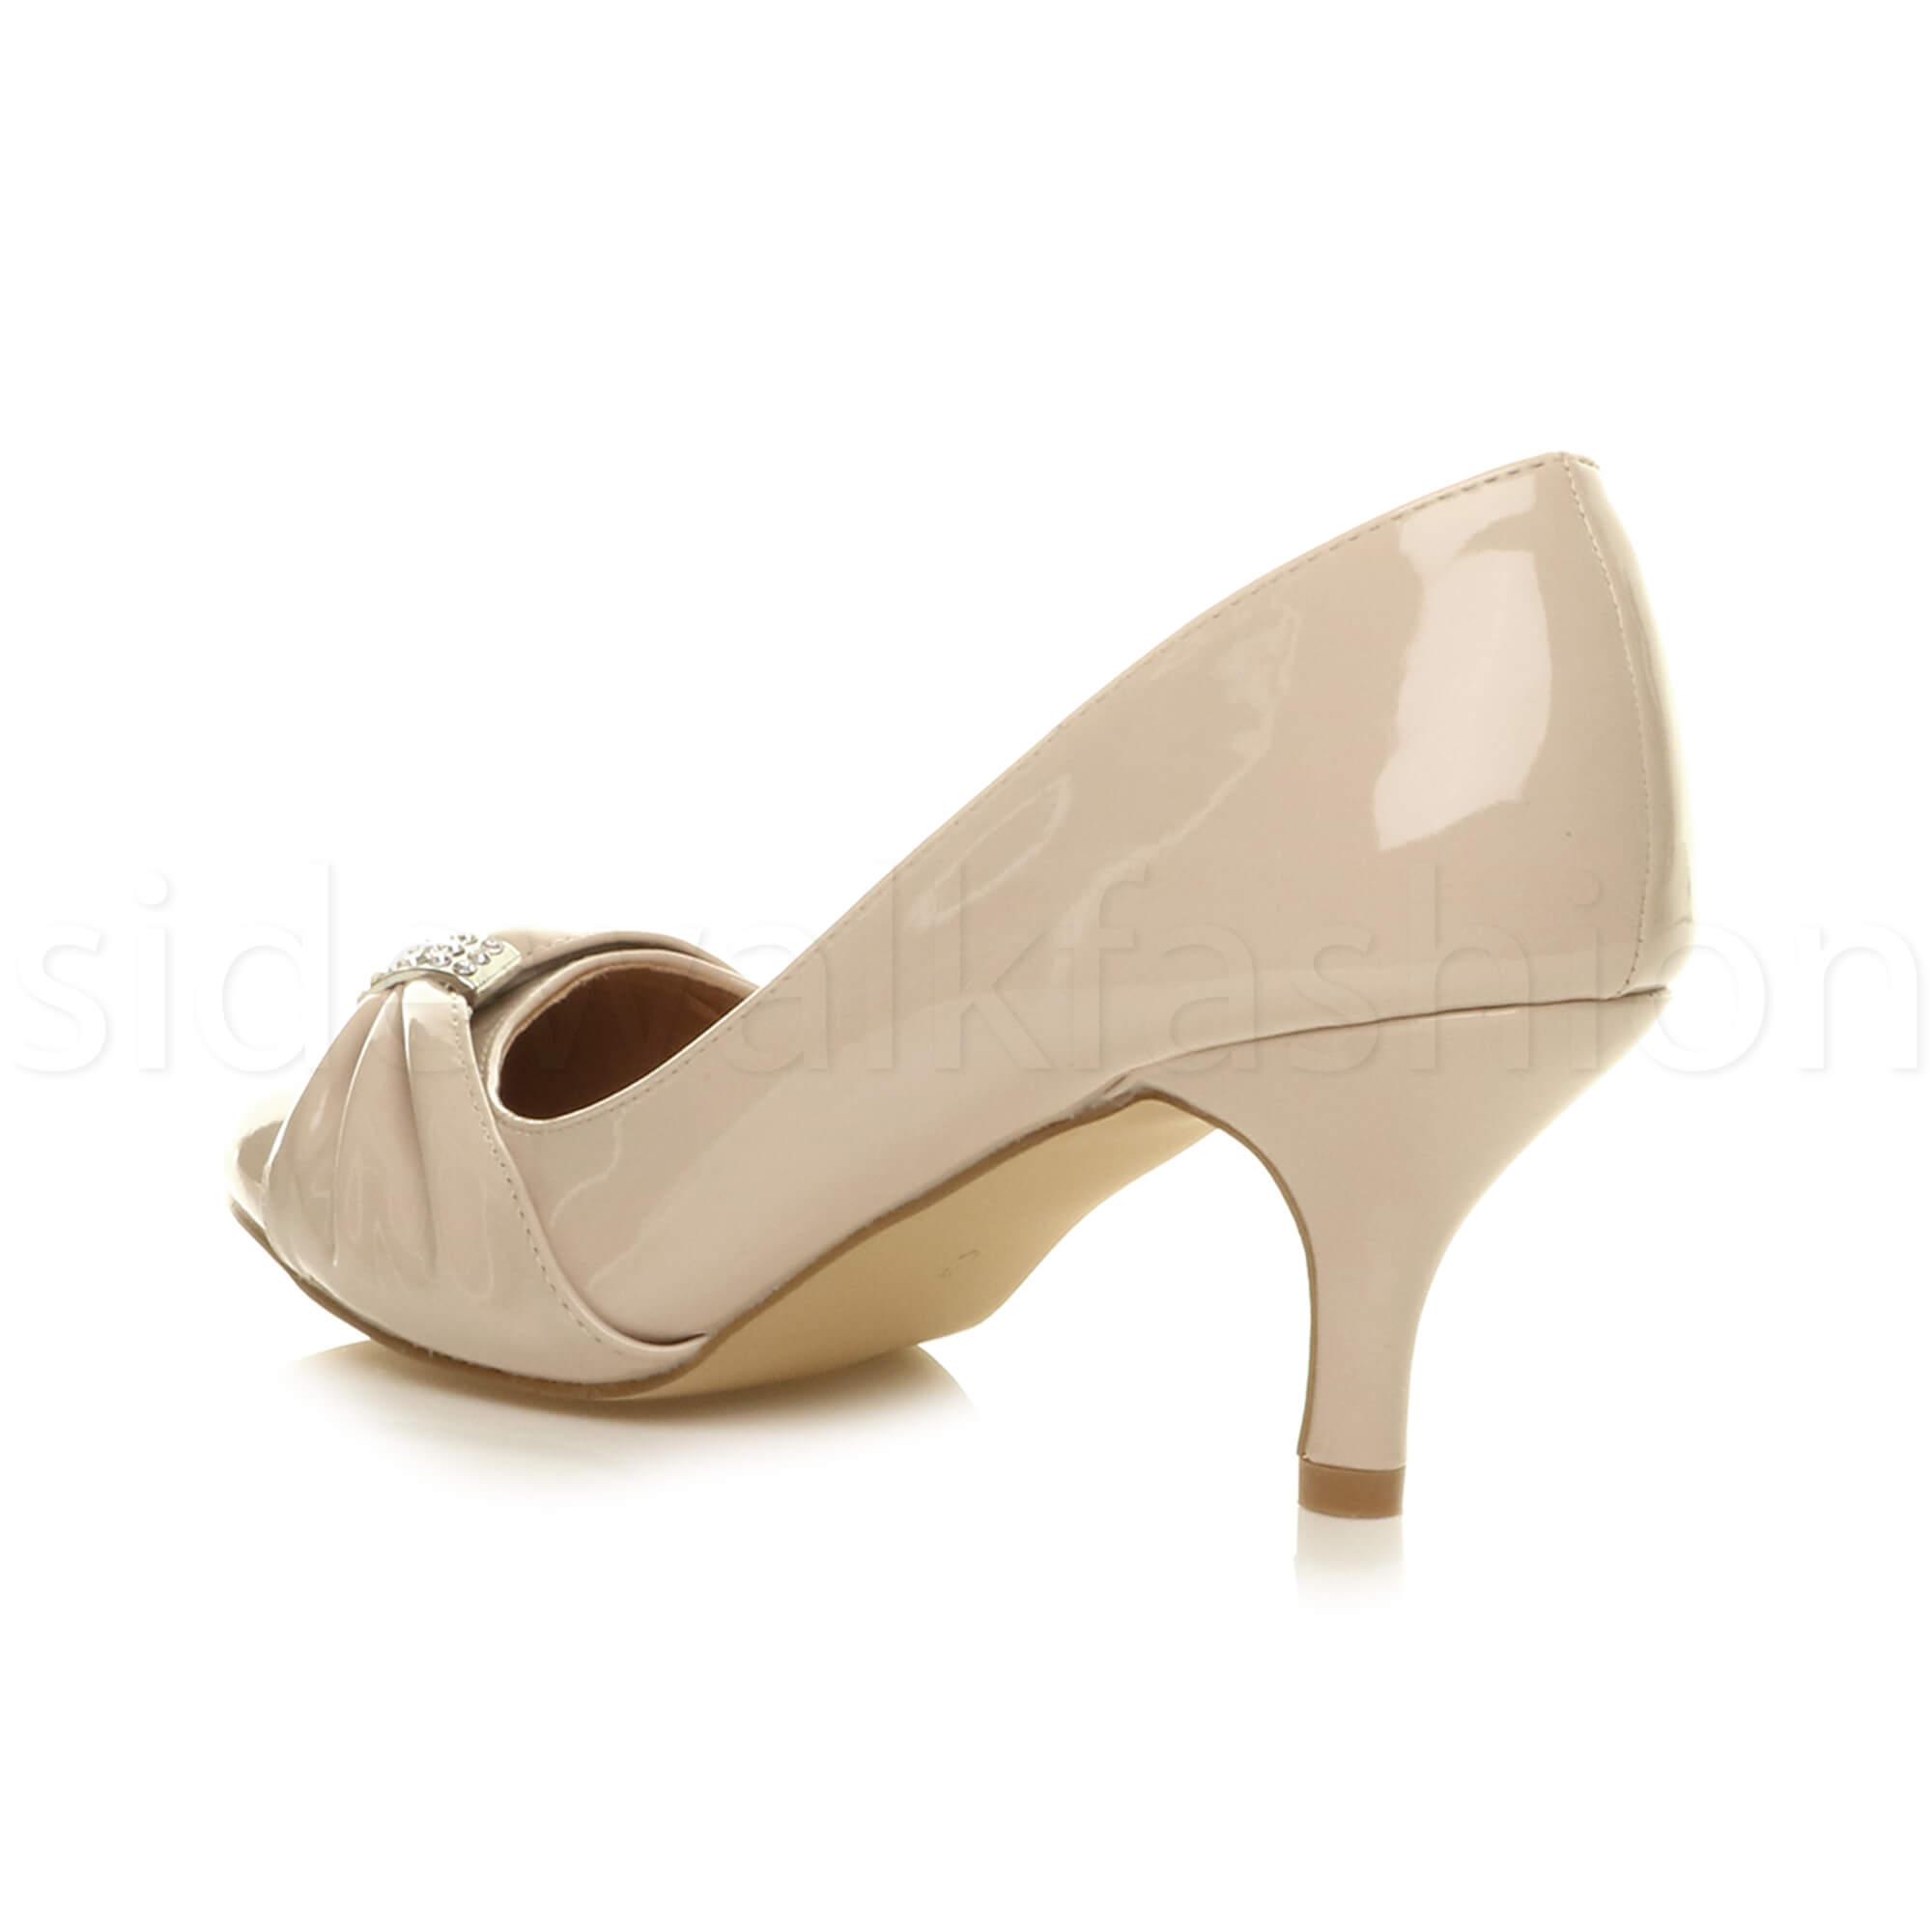 Womens-ladies-low-mid-heel-diamante-party-smart-evening-court-shoes-size thumbnail 69